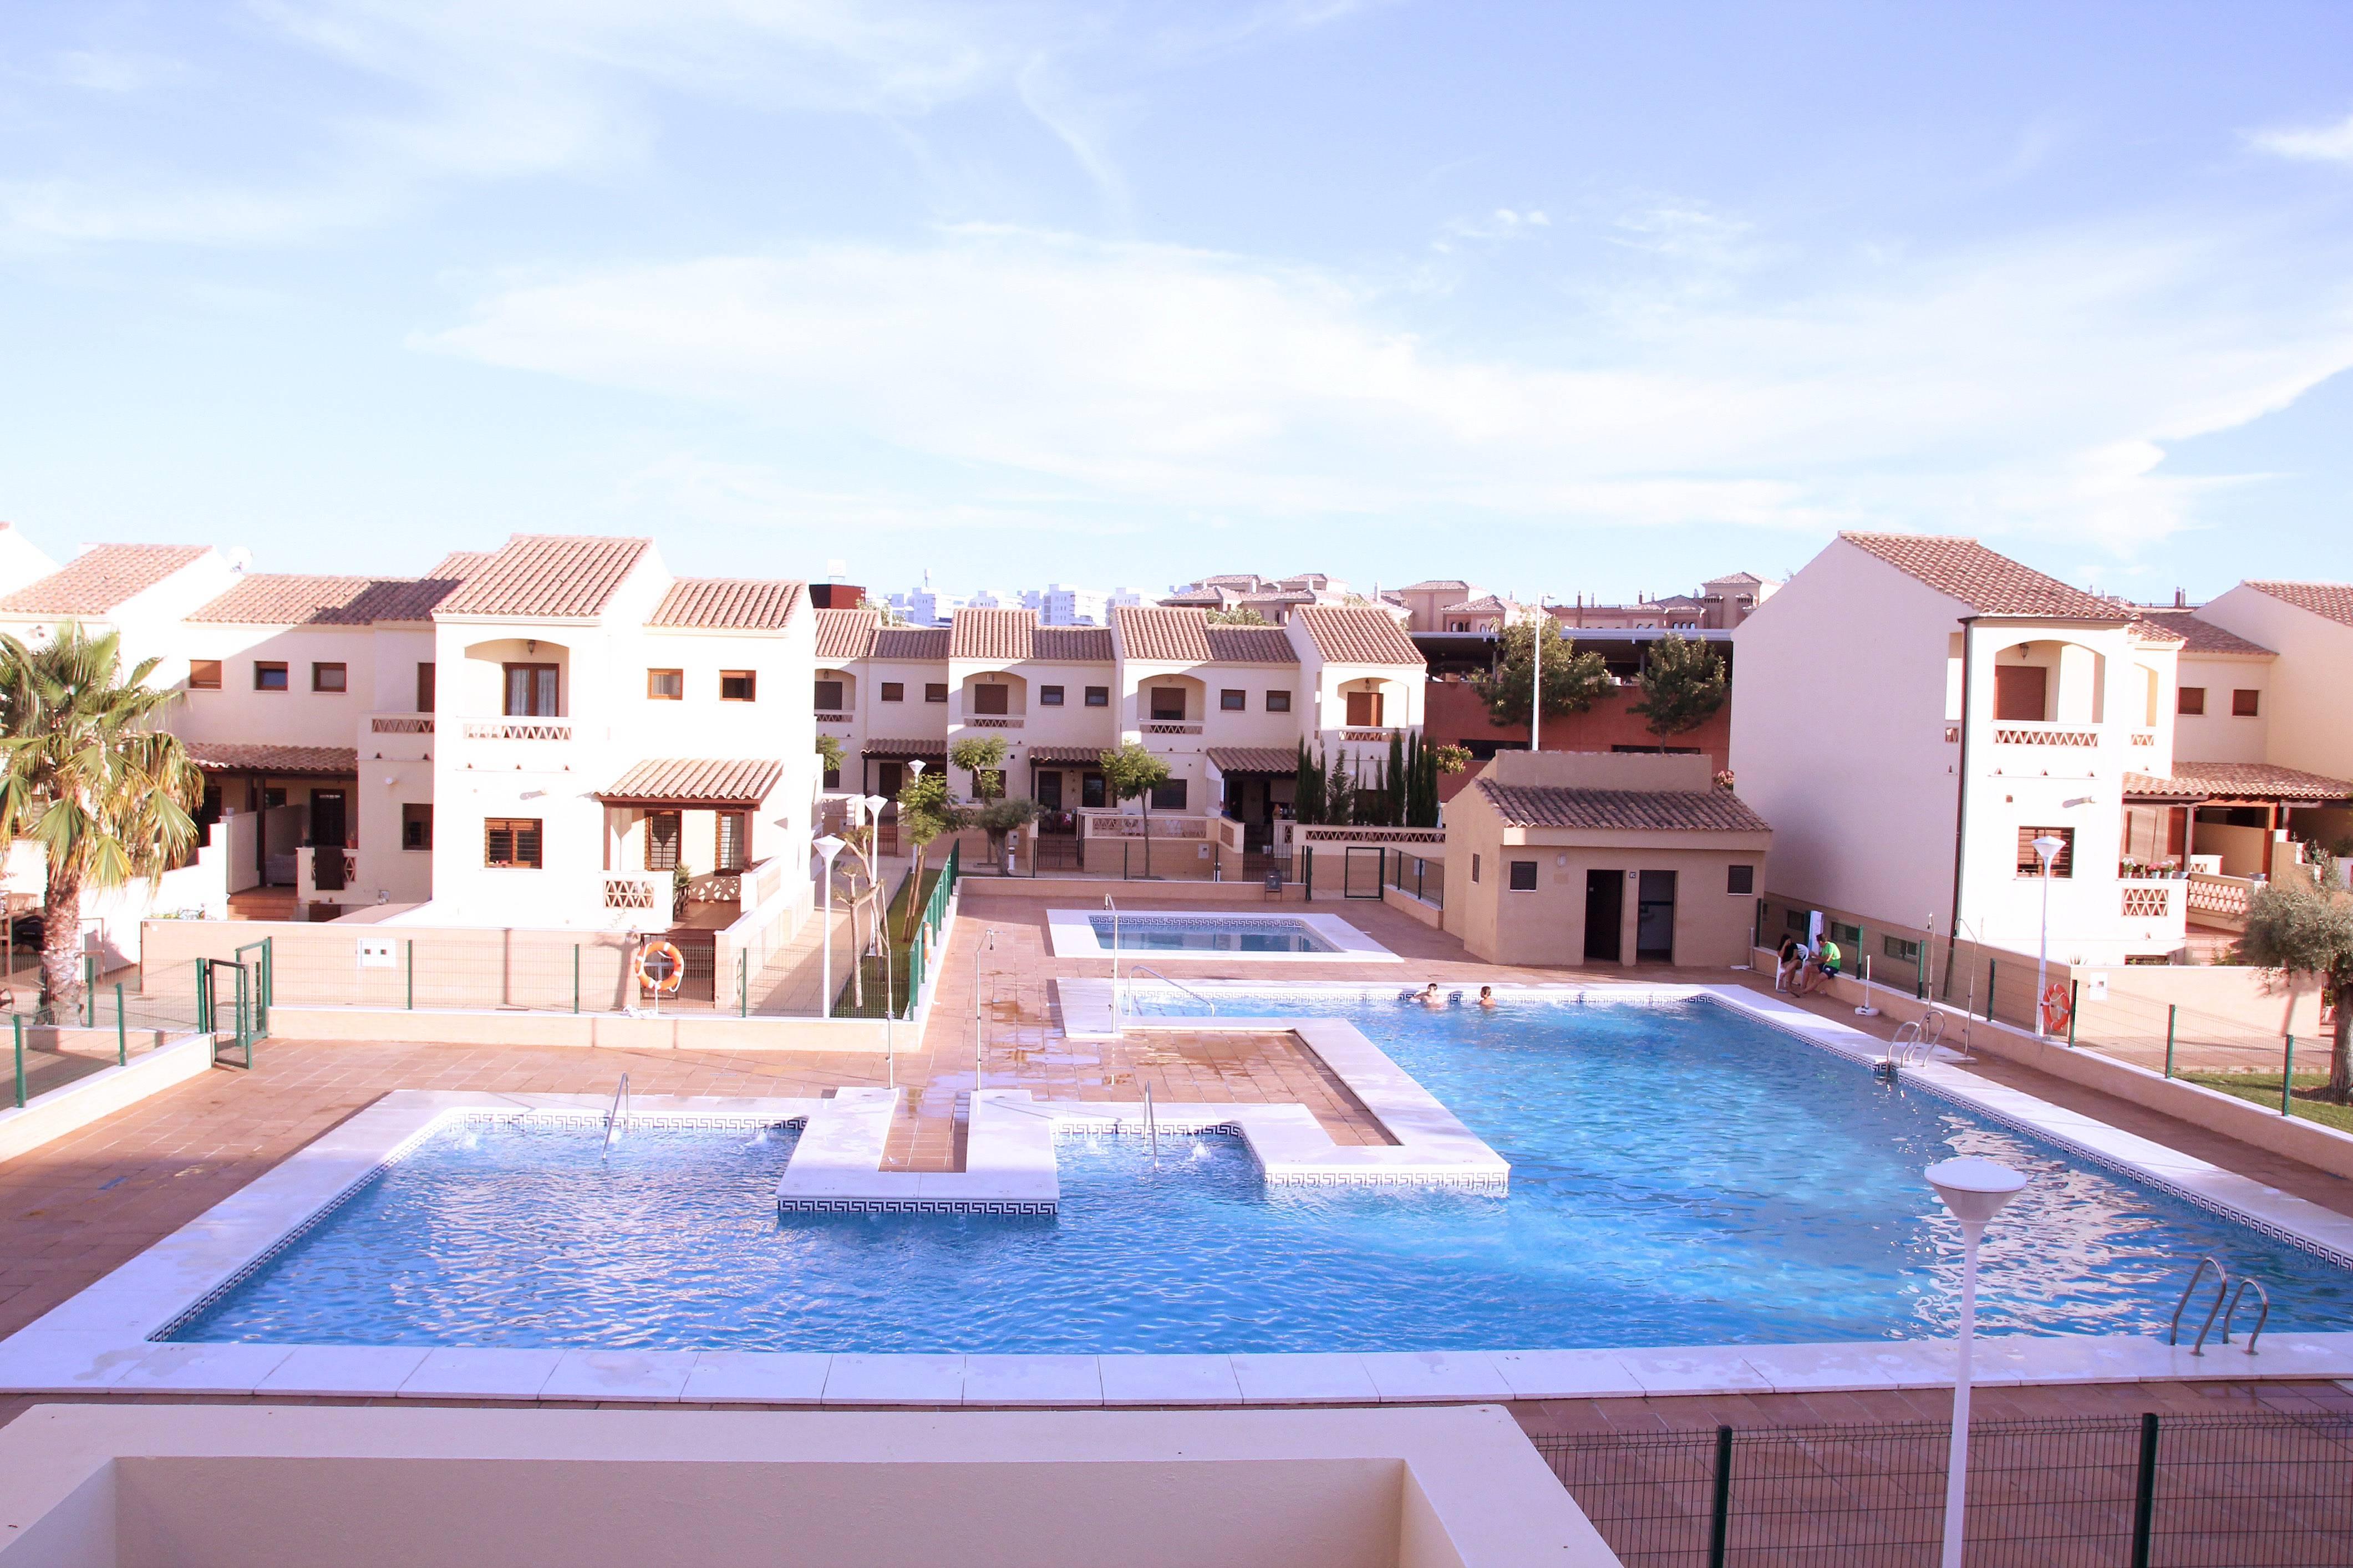 Casa en alquiler a 100 m de la playa punta umbr a huelva costa de la luz - Alquiler casa playa huelva ...